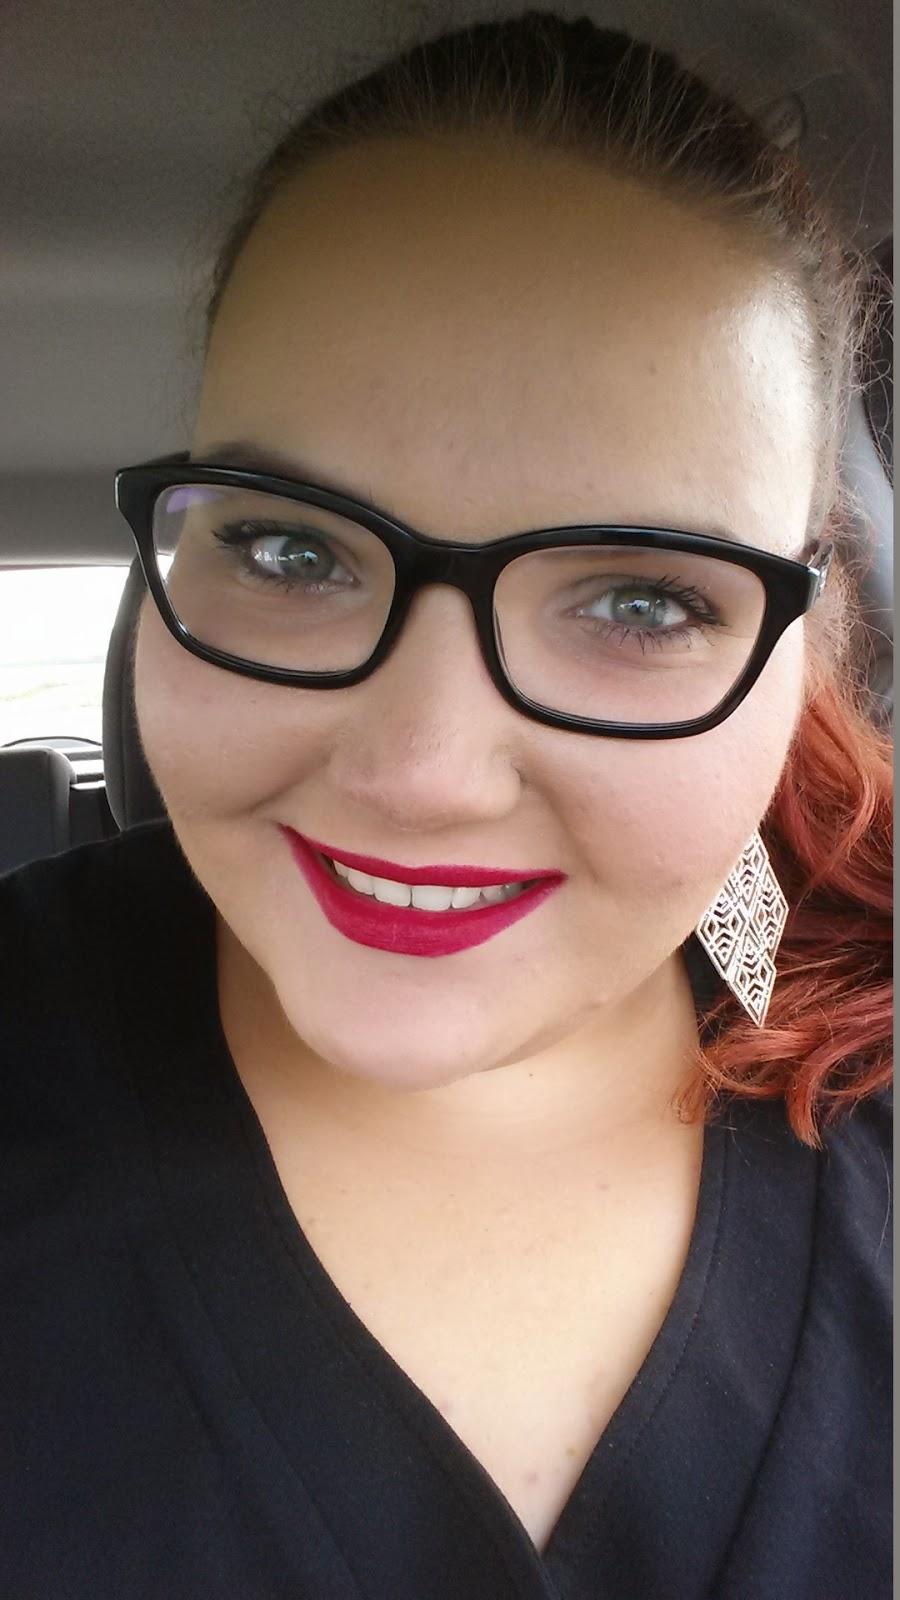 The lipstick attitude: oktober 2014